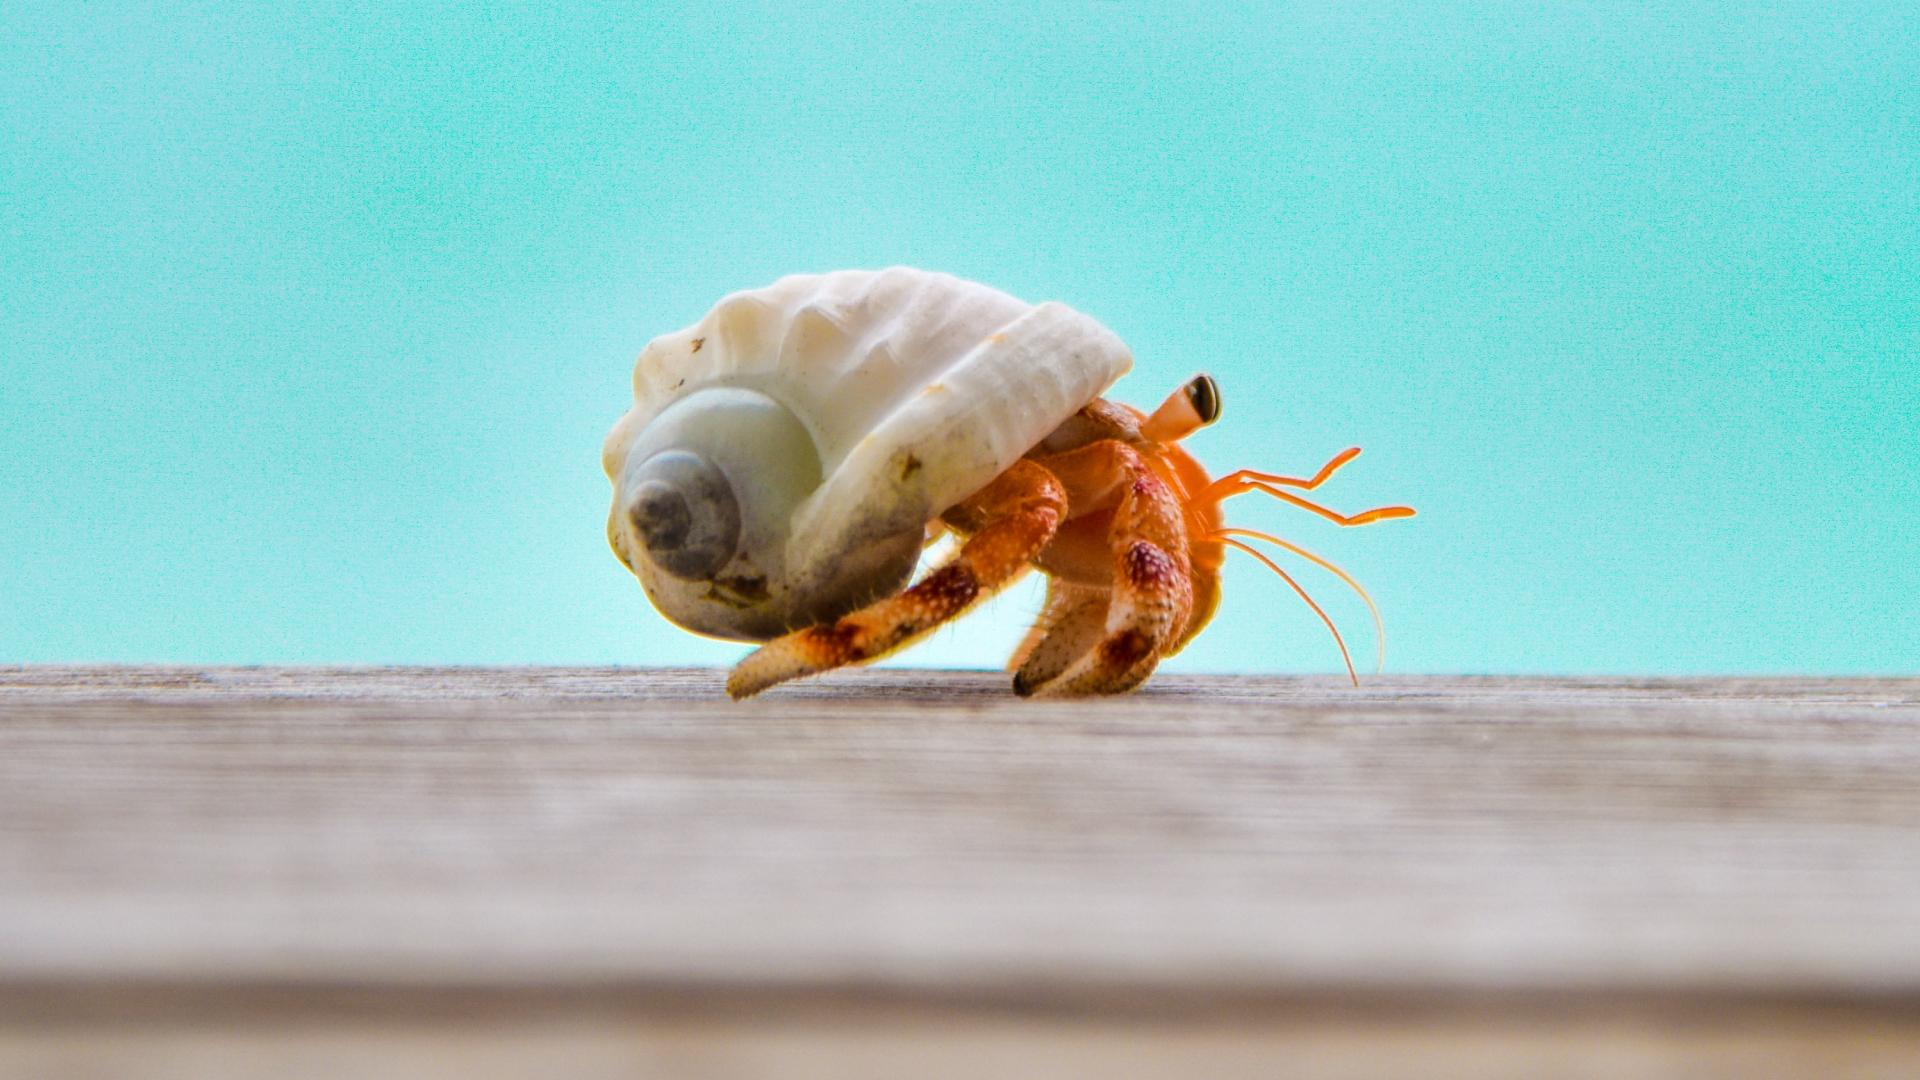 NIGHT DIVE – The Hermit Crab